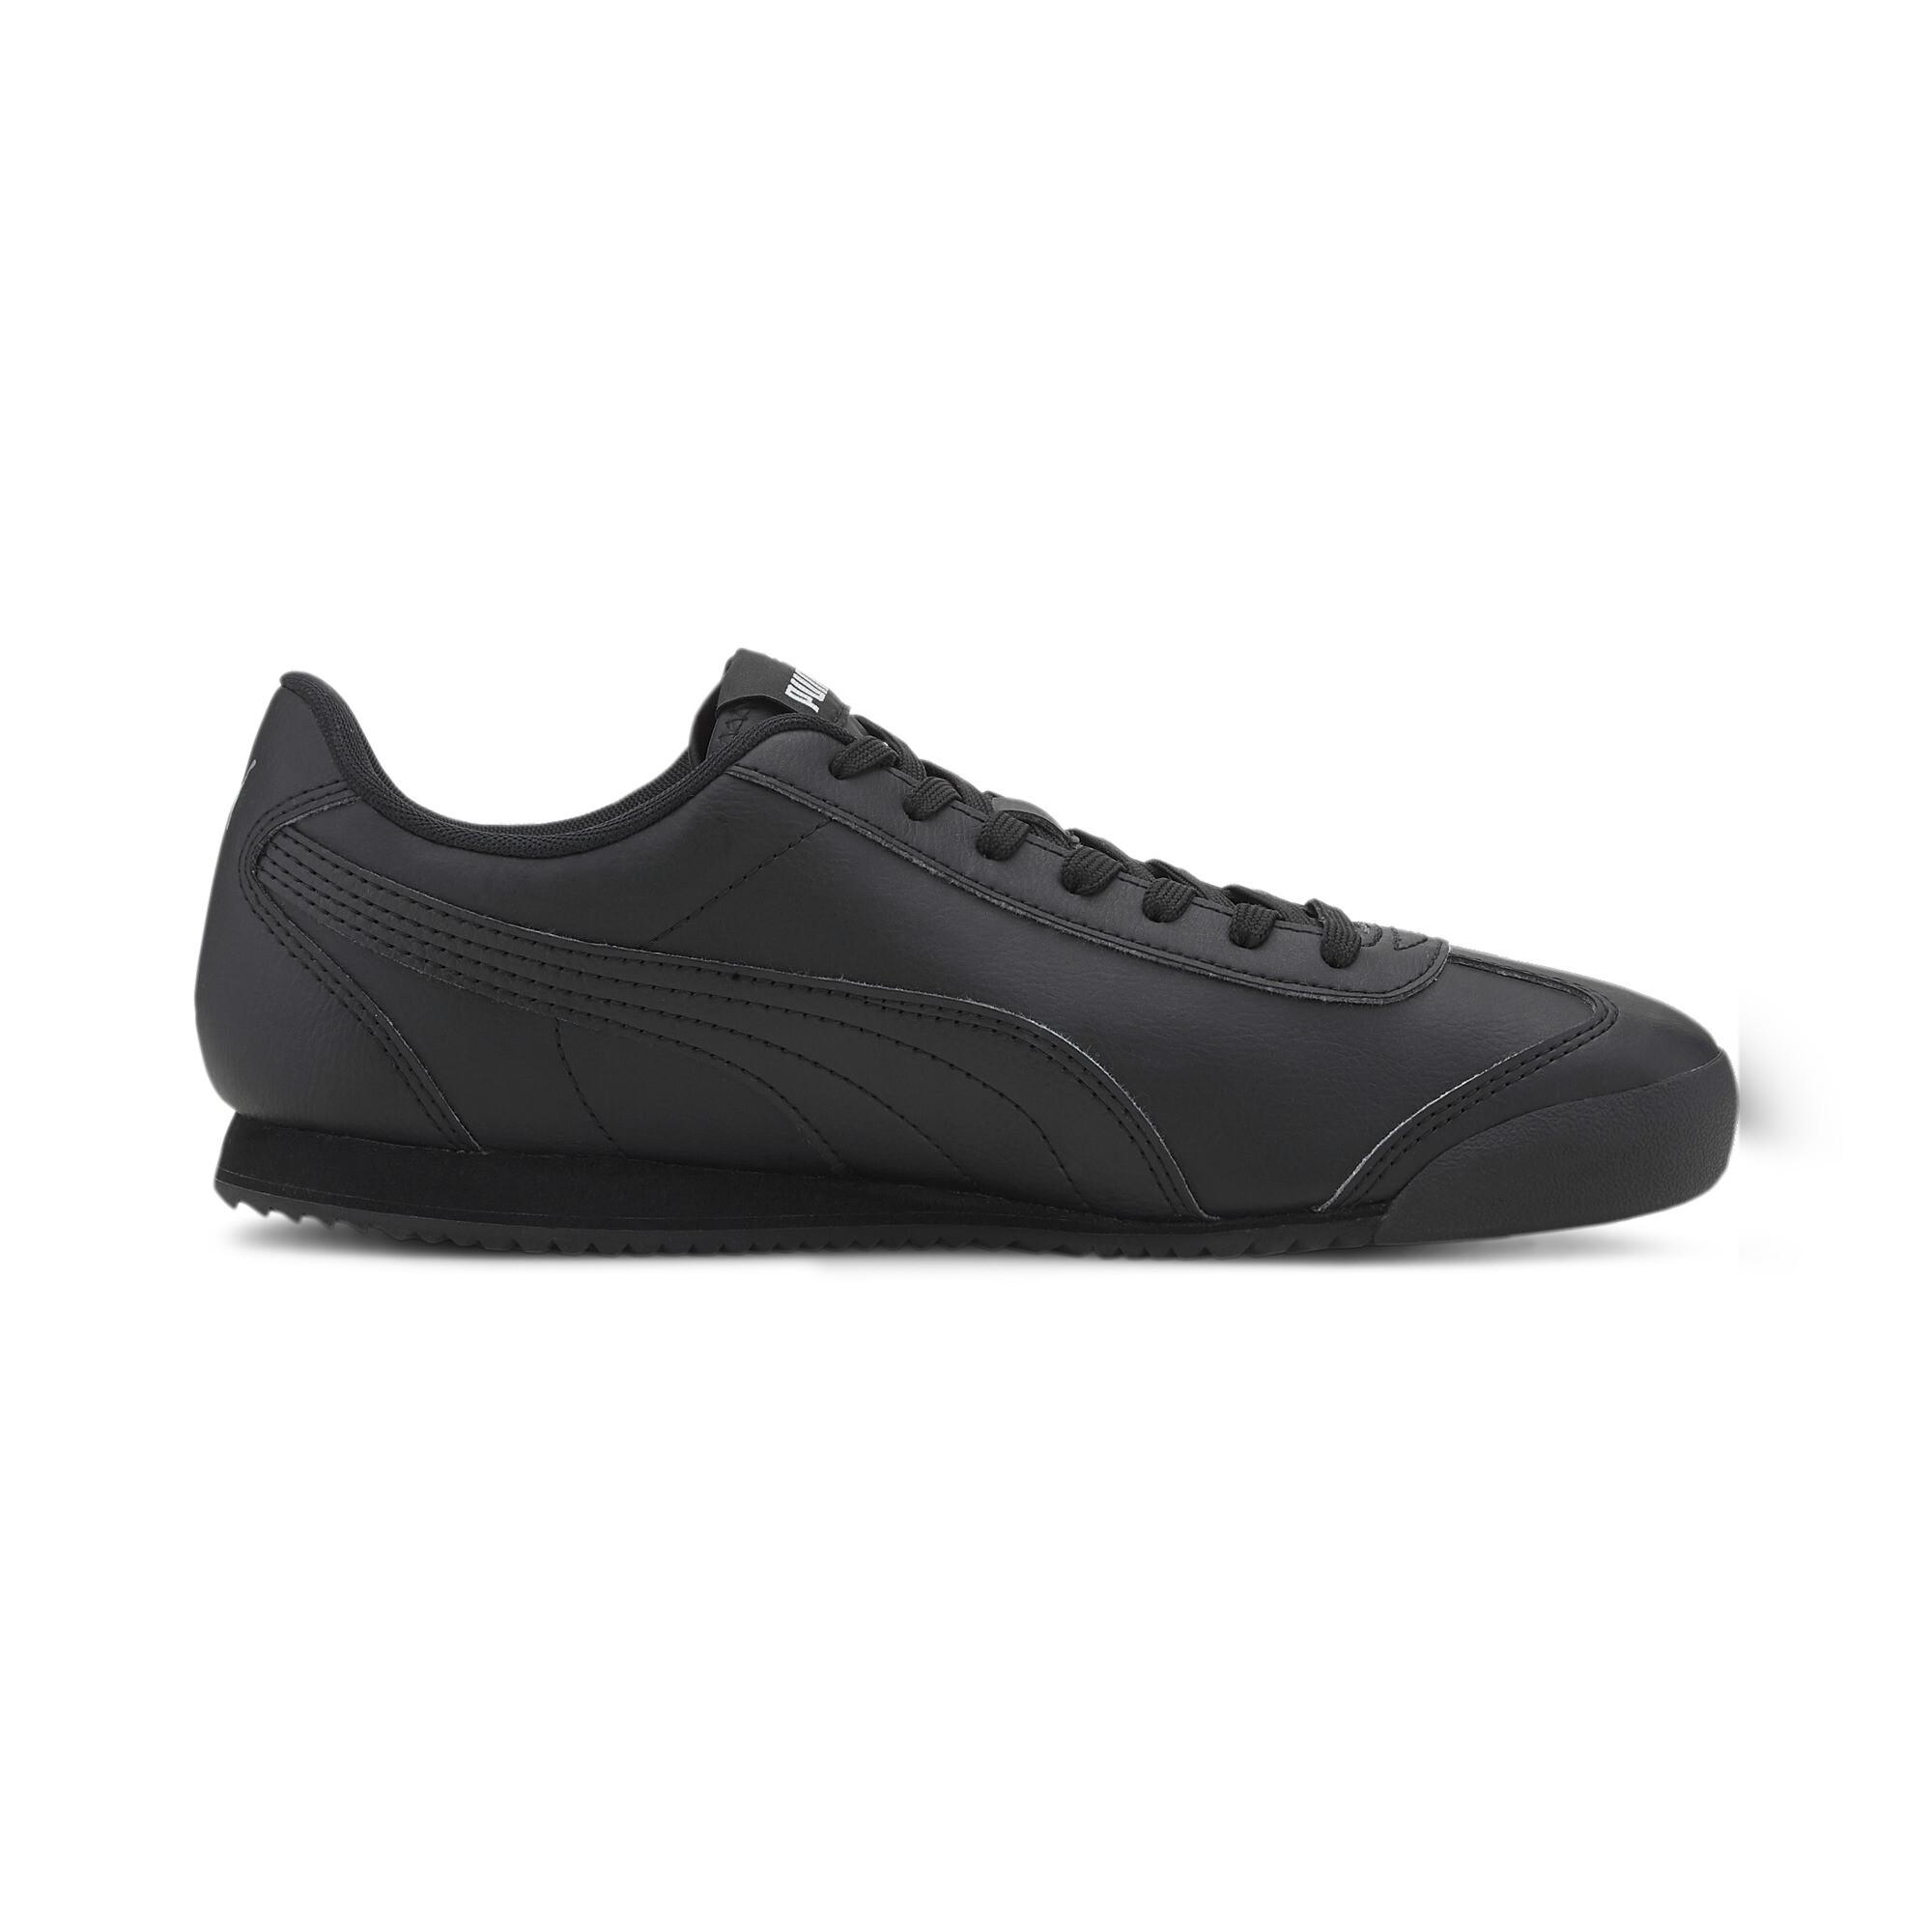 thumbnail 11 - PUMA Men's Turino SL Sneakers